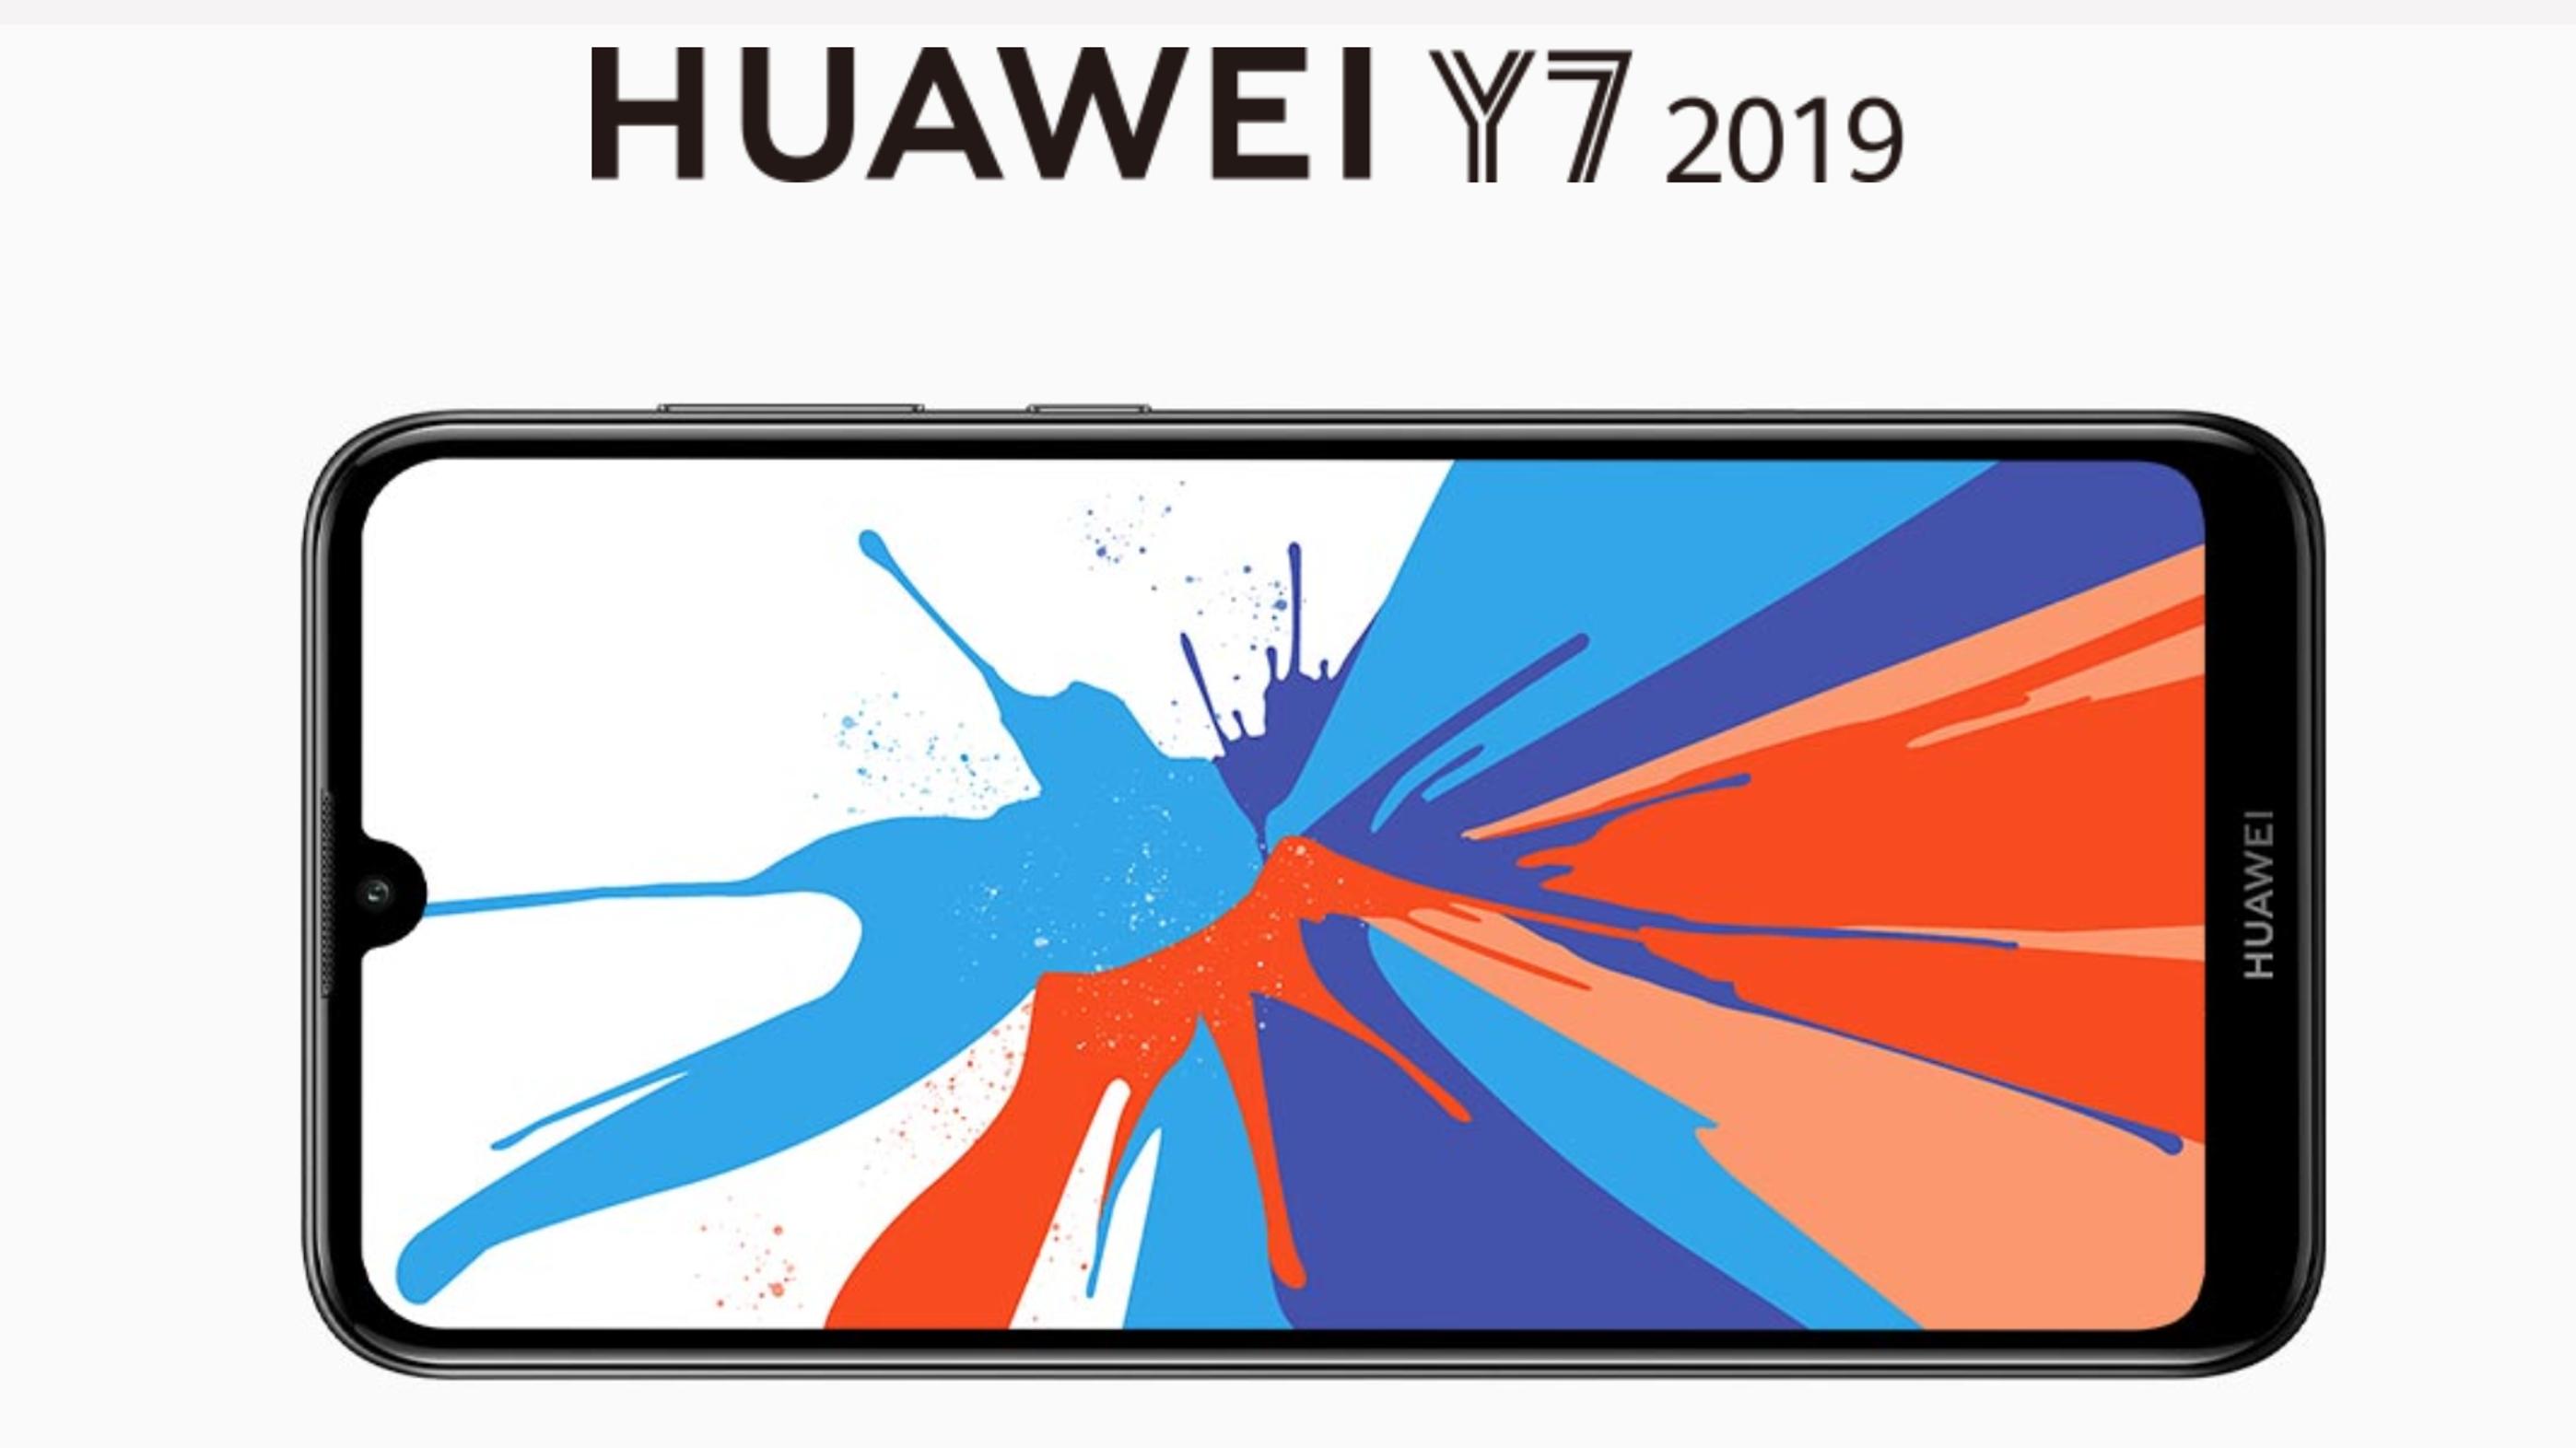 Huawei Y7のスペックと製品仕様